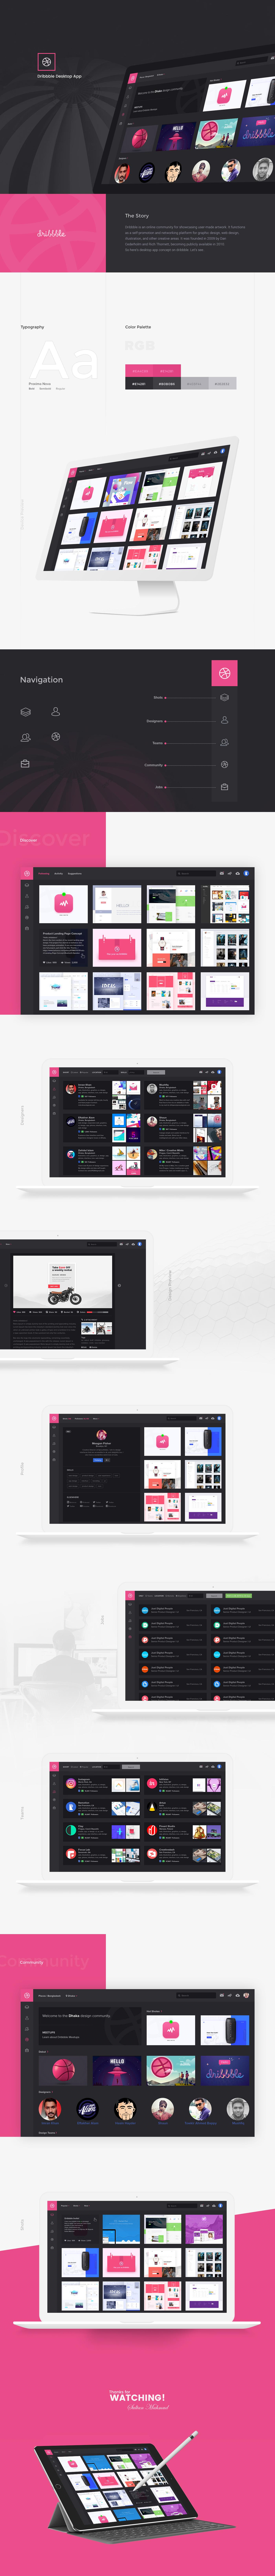 app dribbble Web featured concept desktop Bangladesh portfolio user interface user experience